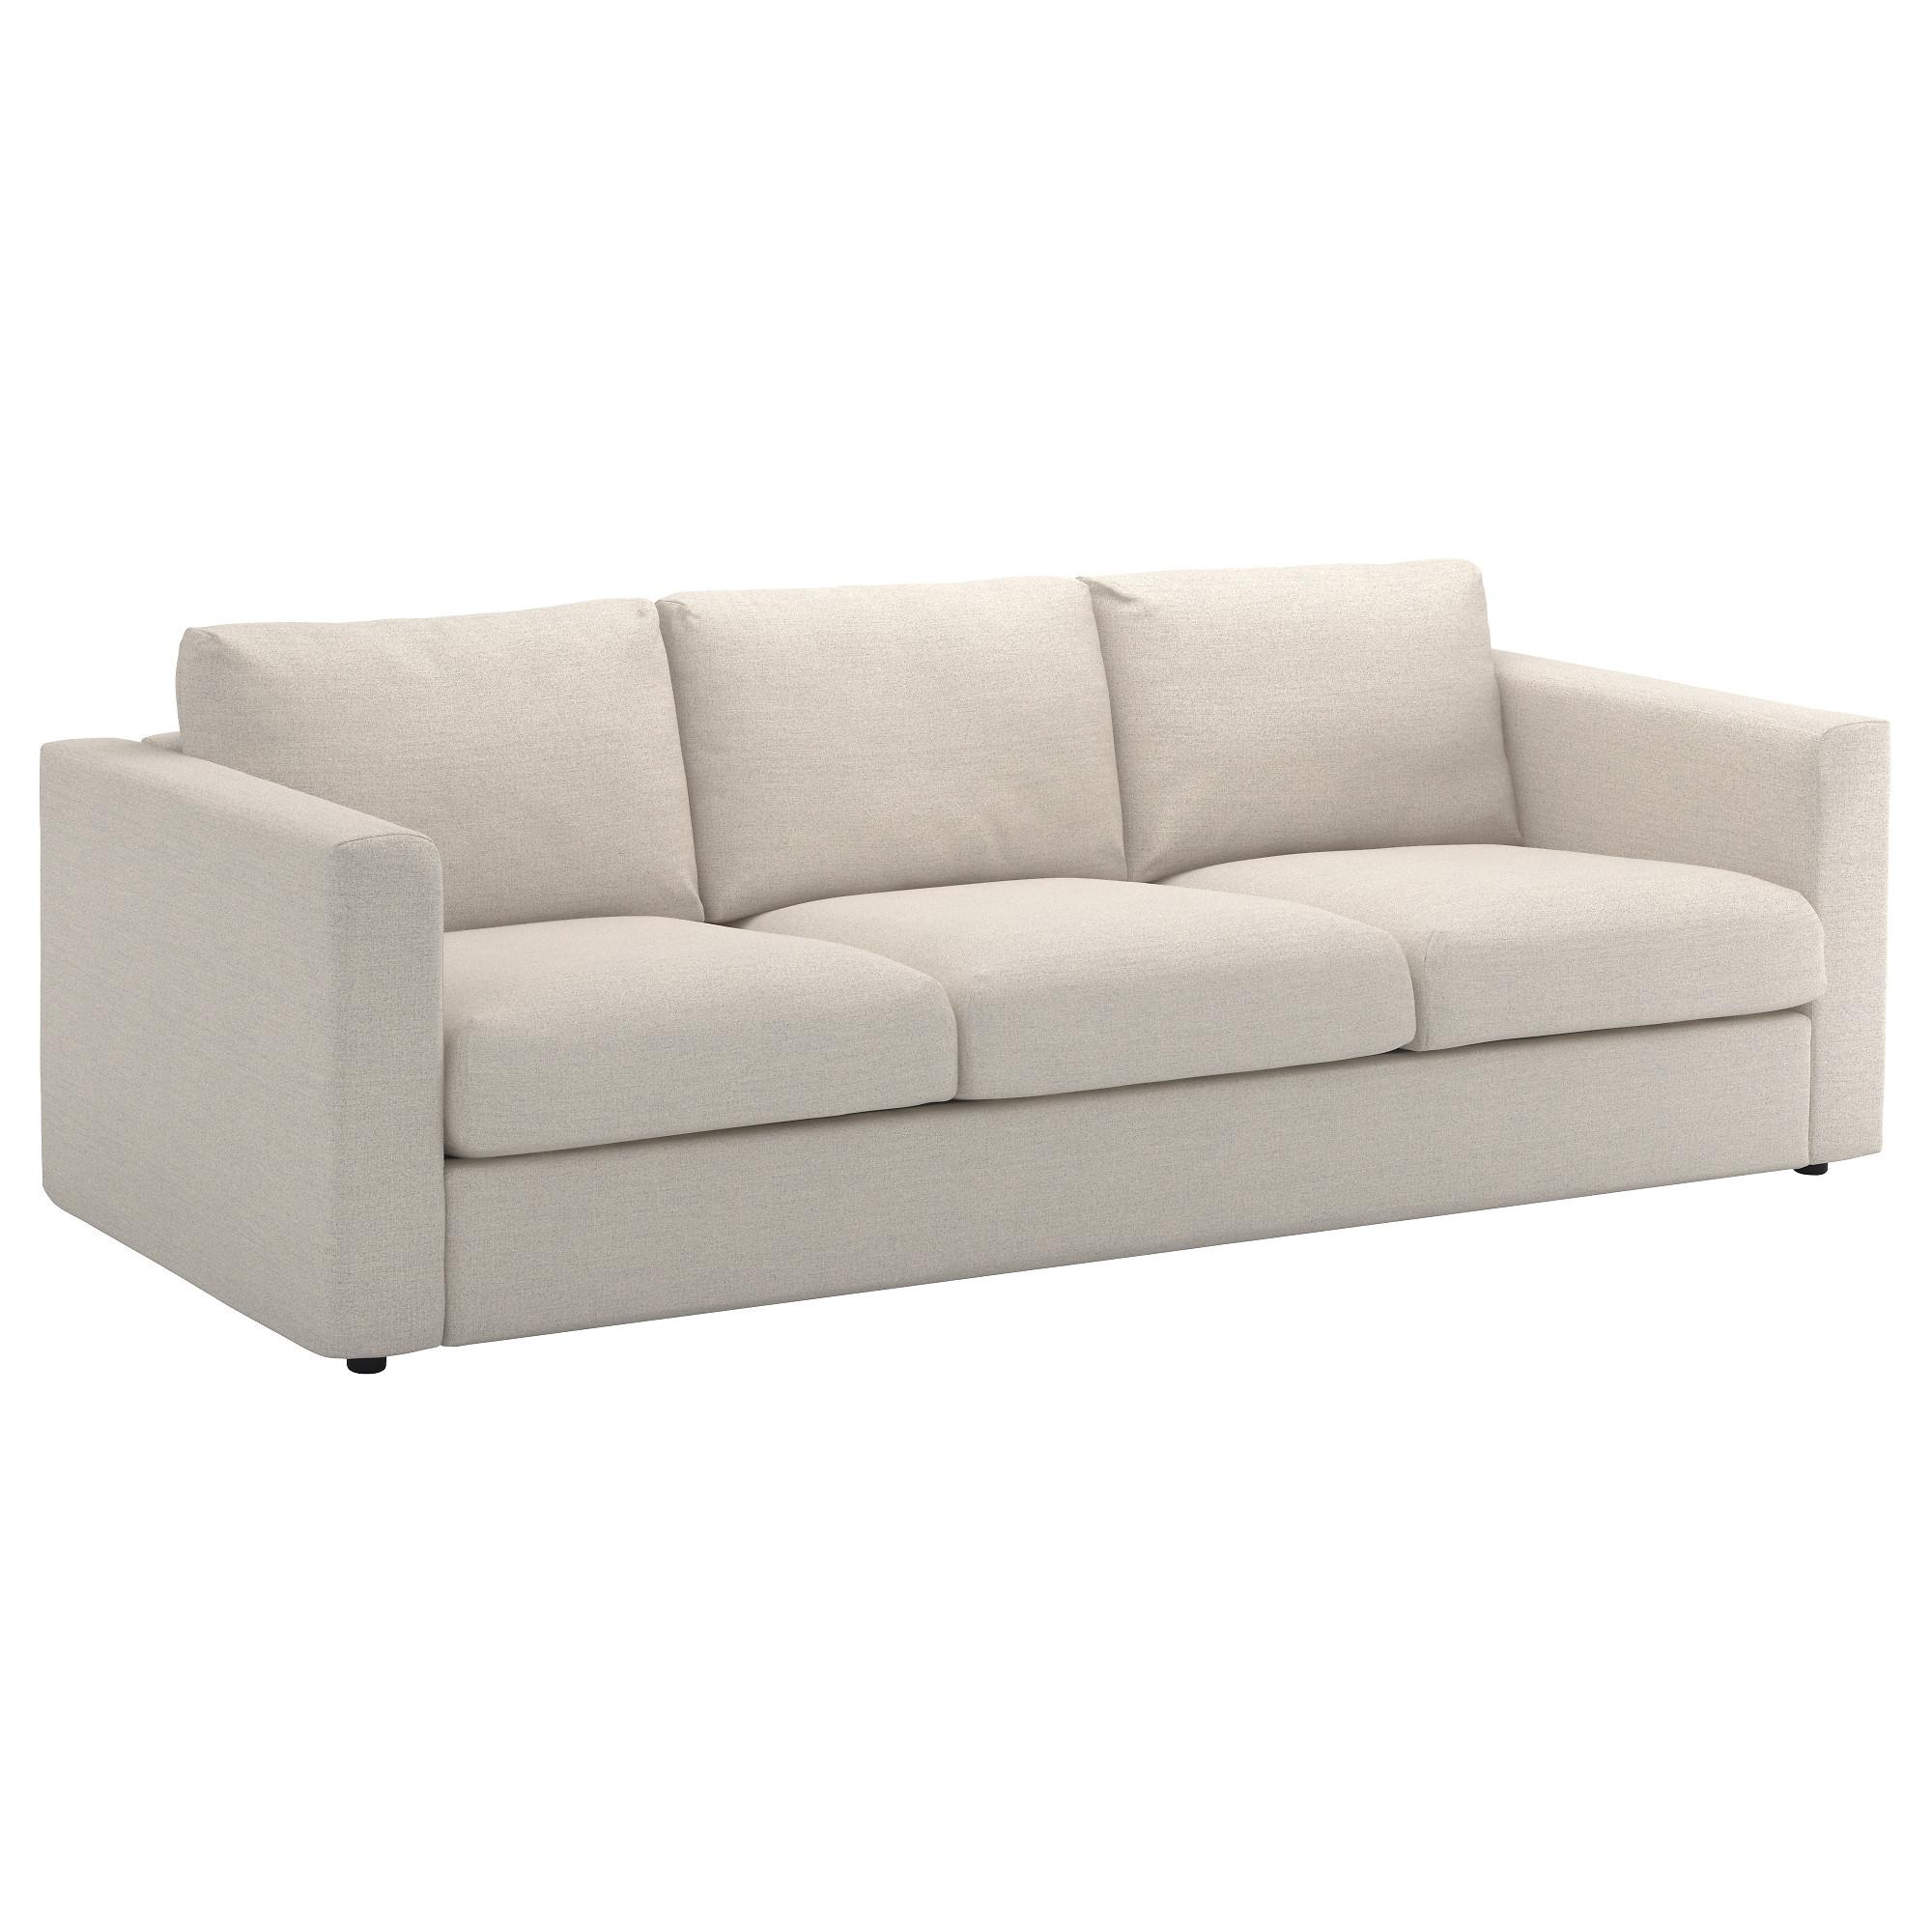 Sofas Tres Plazas Tldn Vimle sofà 3 Plazas Gunnared Beige Ikea